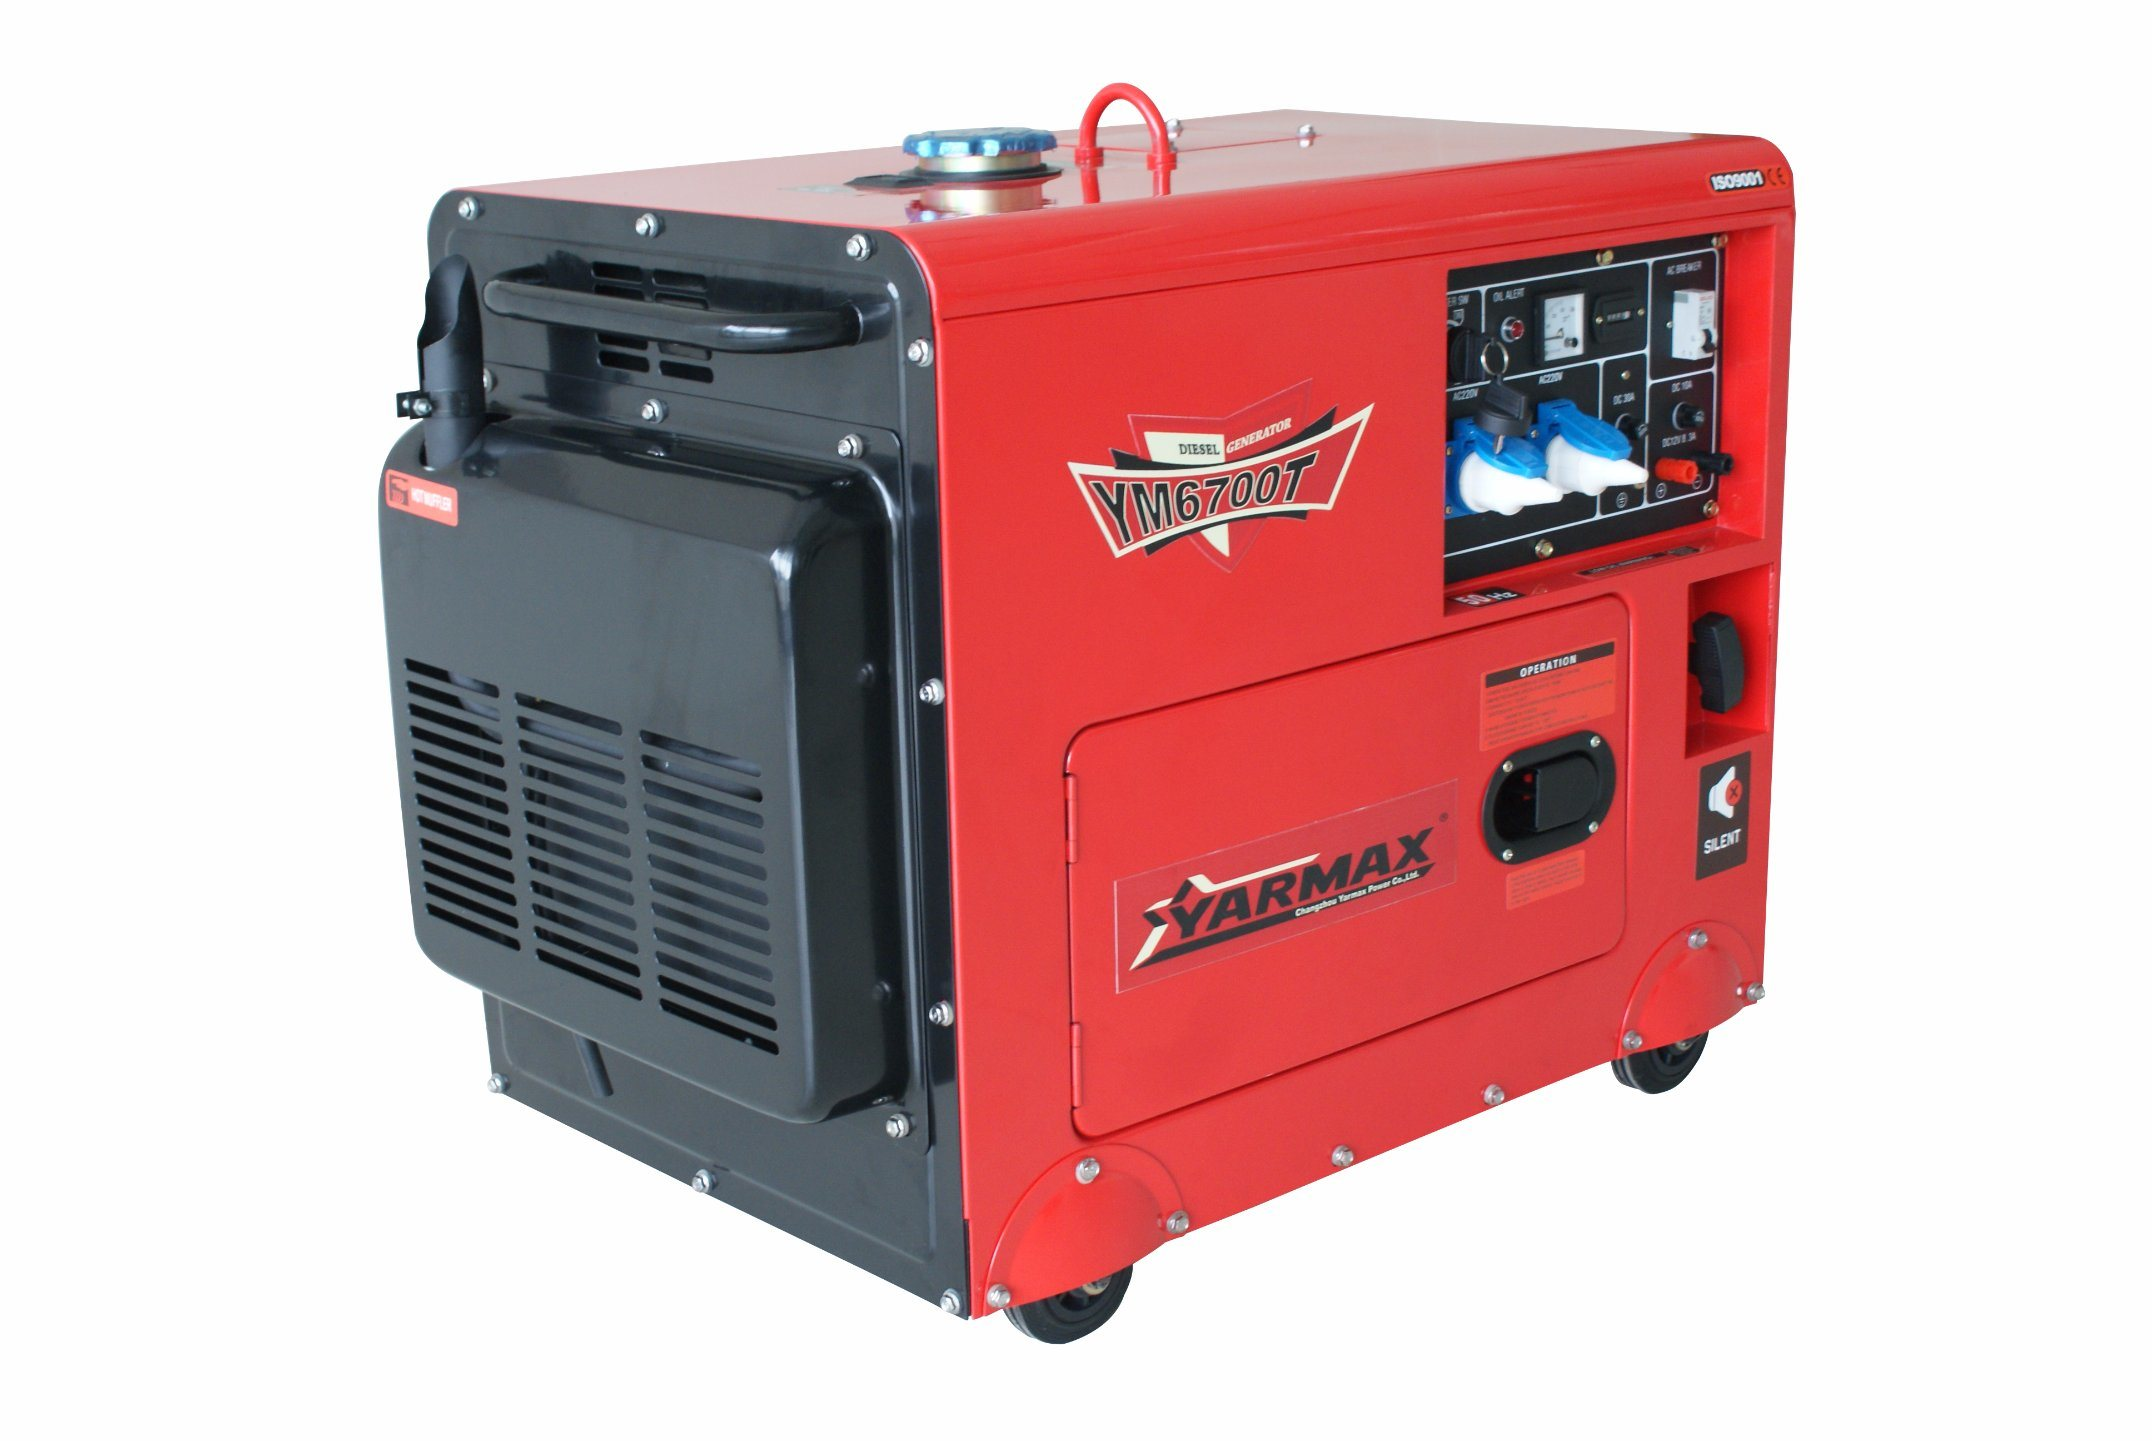 China Yarmax Diesel Generator Ym6700t Portable Genset 4 5kVA 5 5